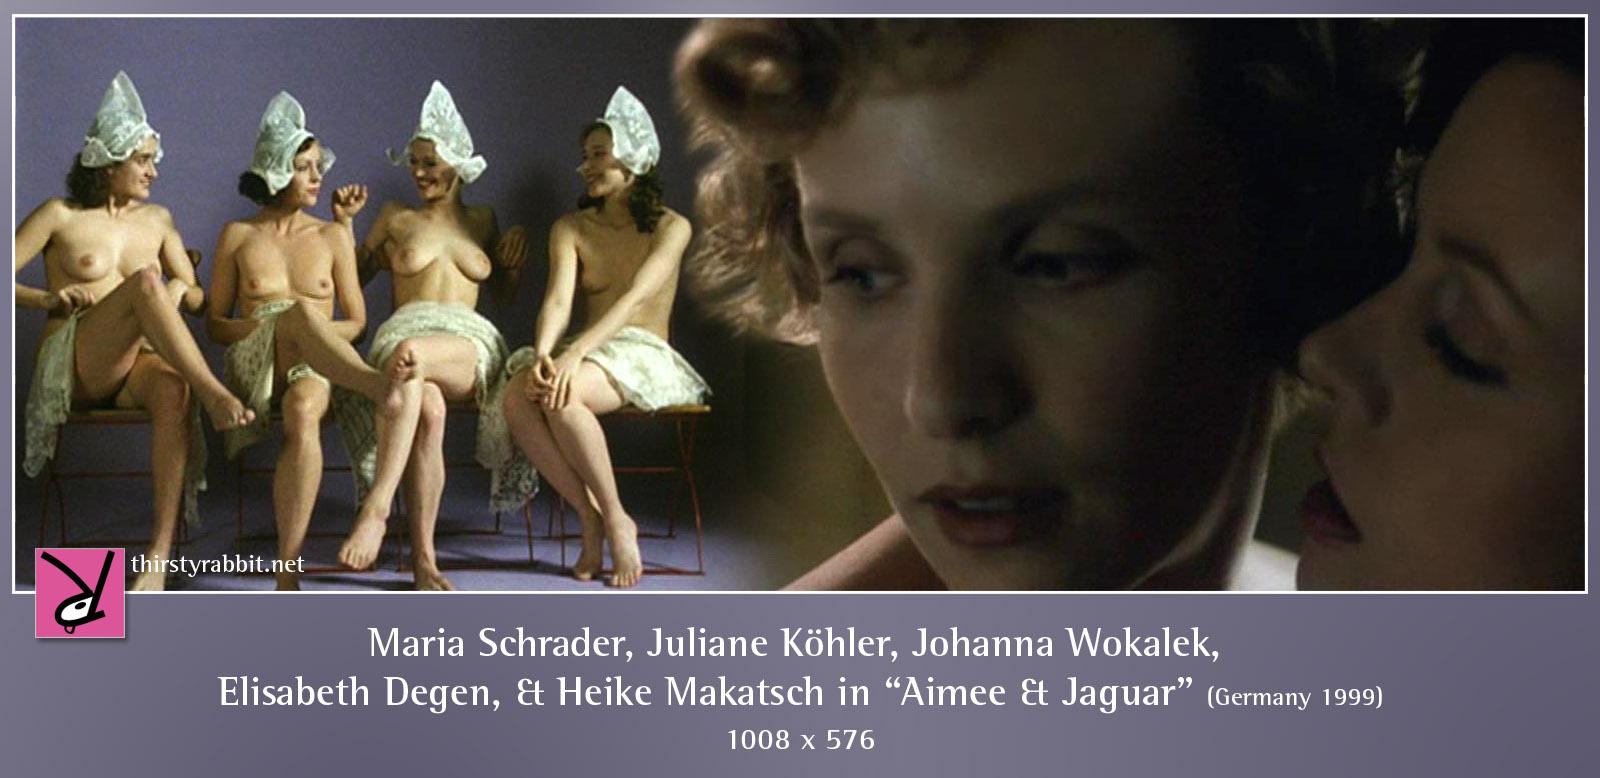 Heike makatsch nude naked pictures, elder pussys